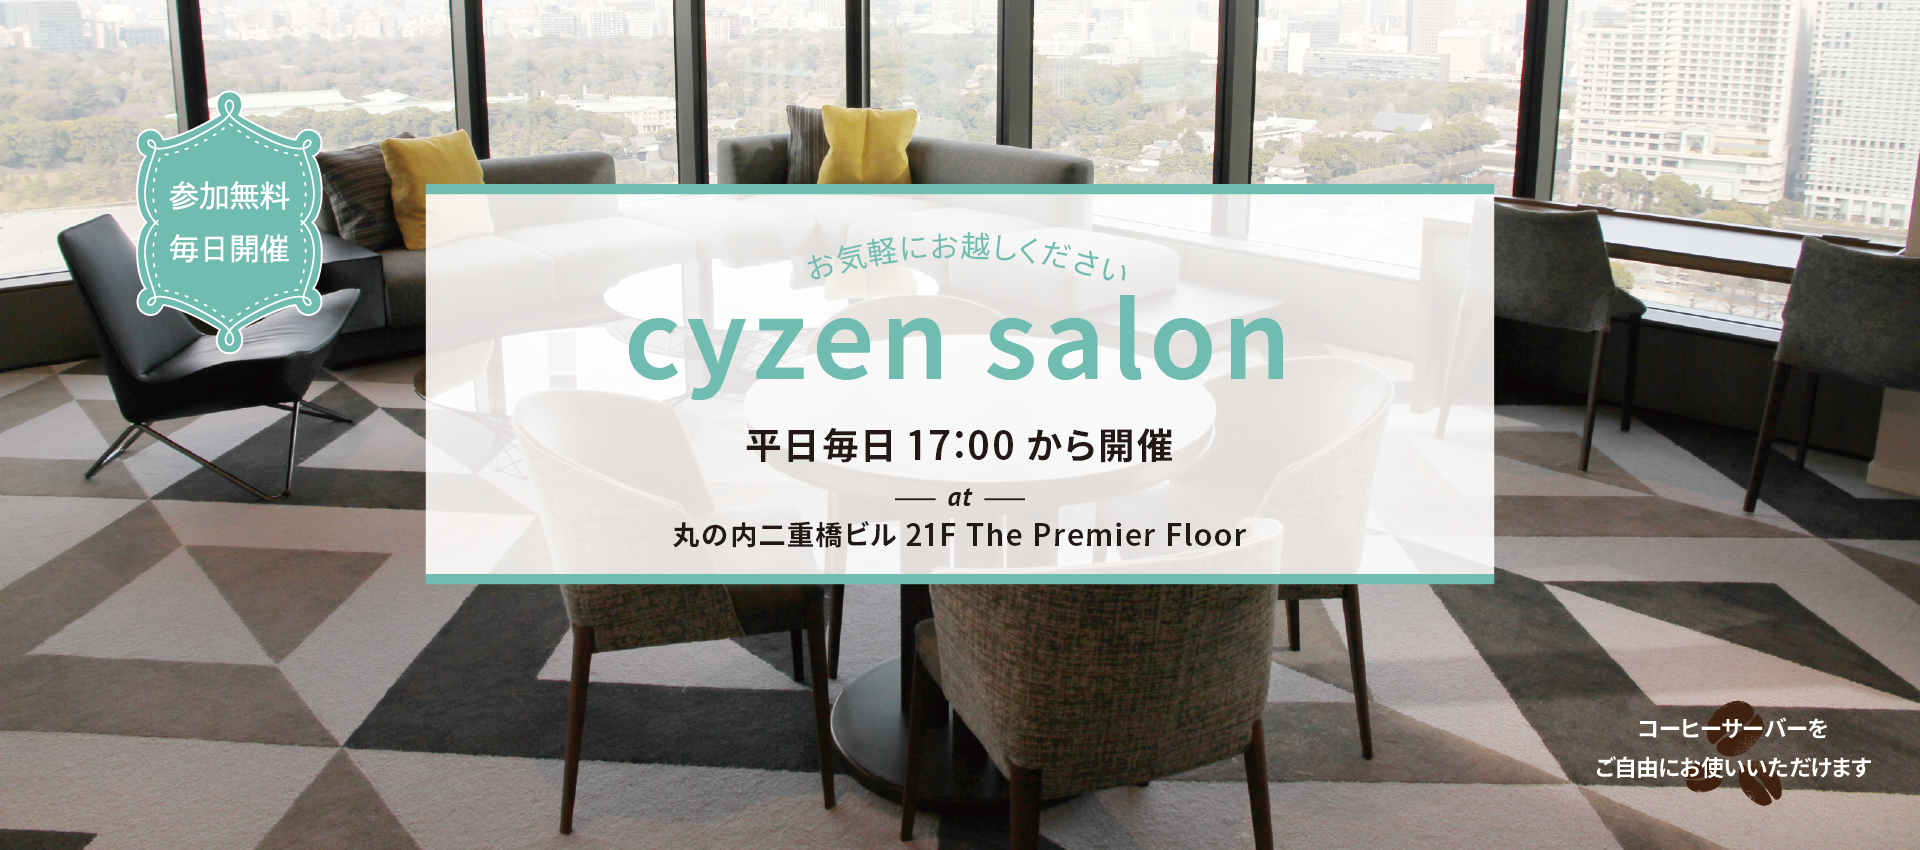 cyzensalon_0724